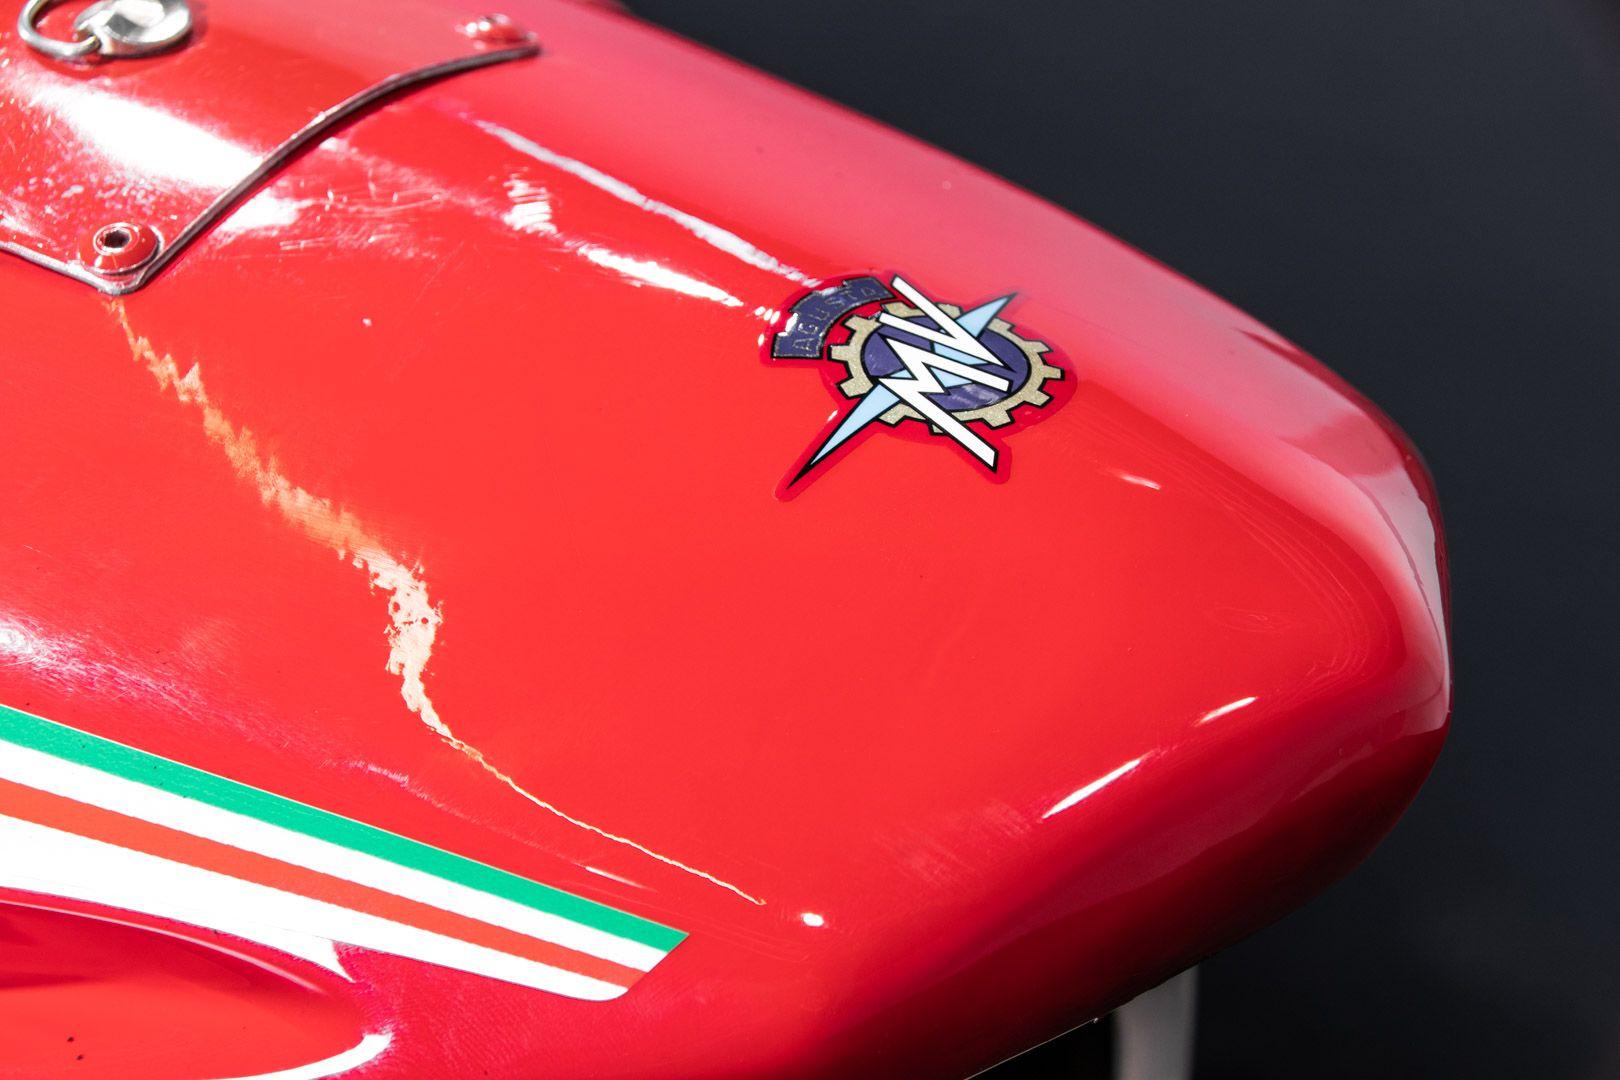 2007 MV Agusta F4 1000 R 81454